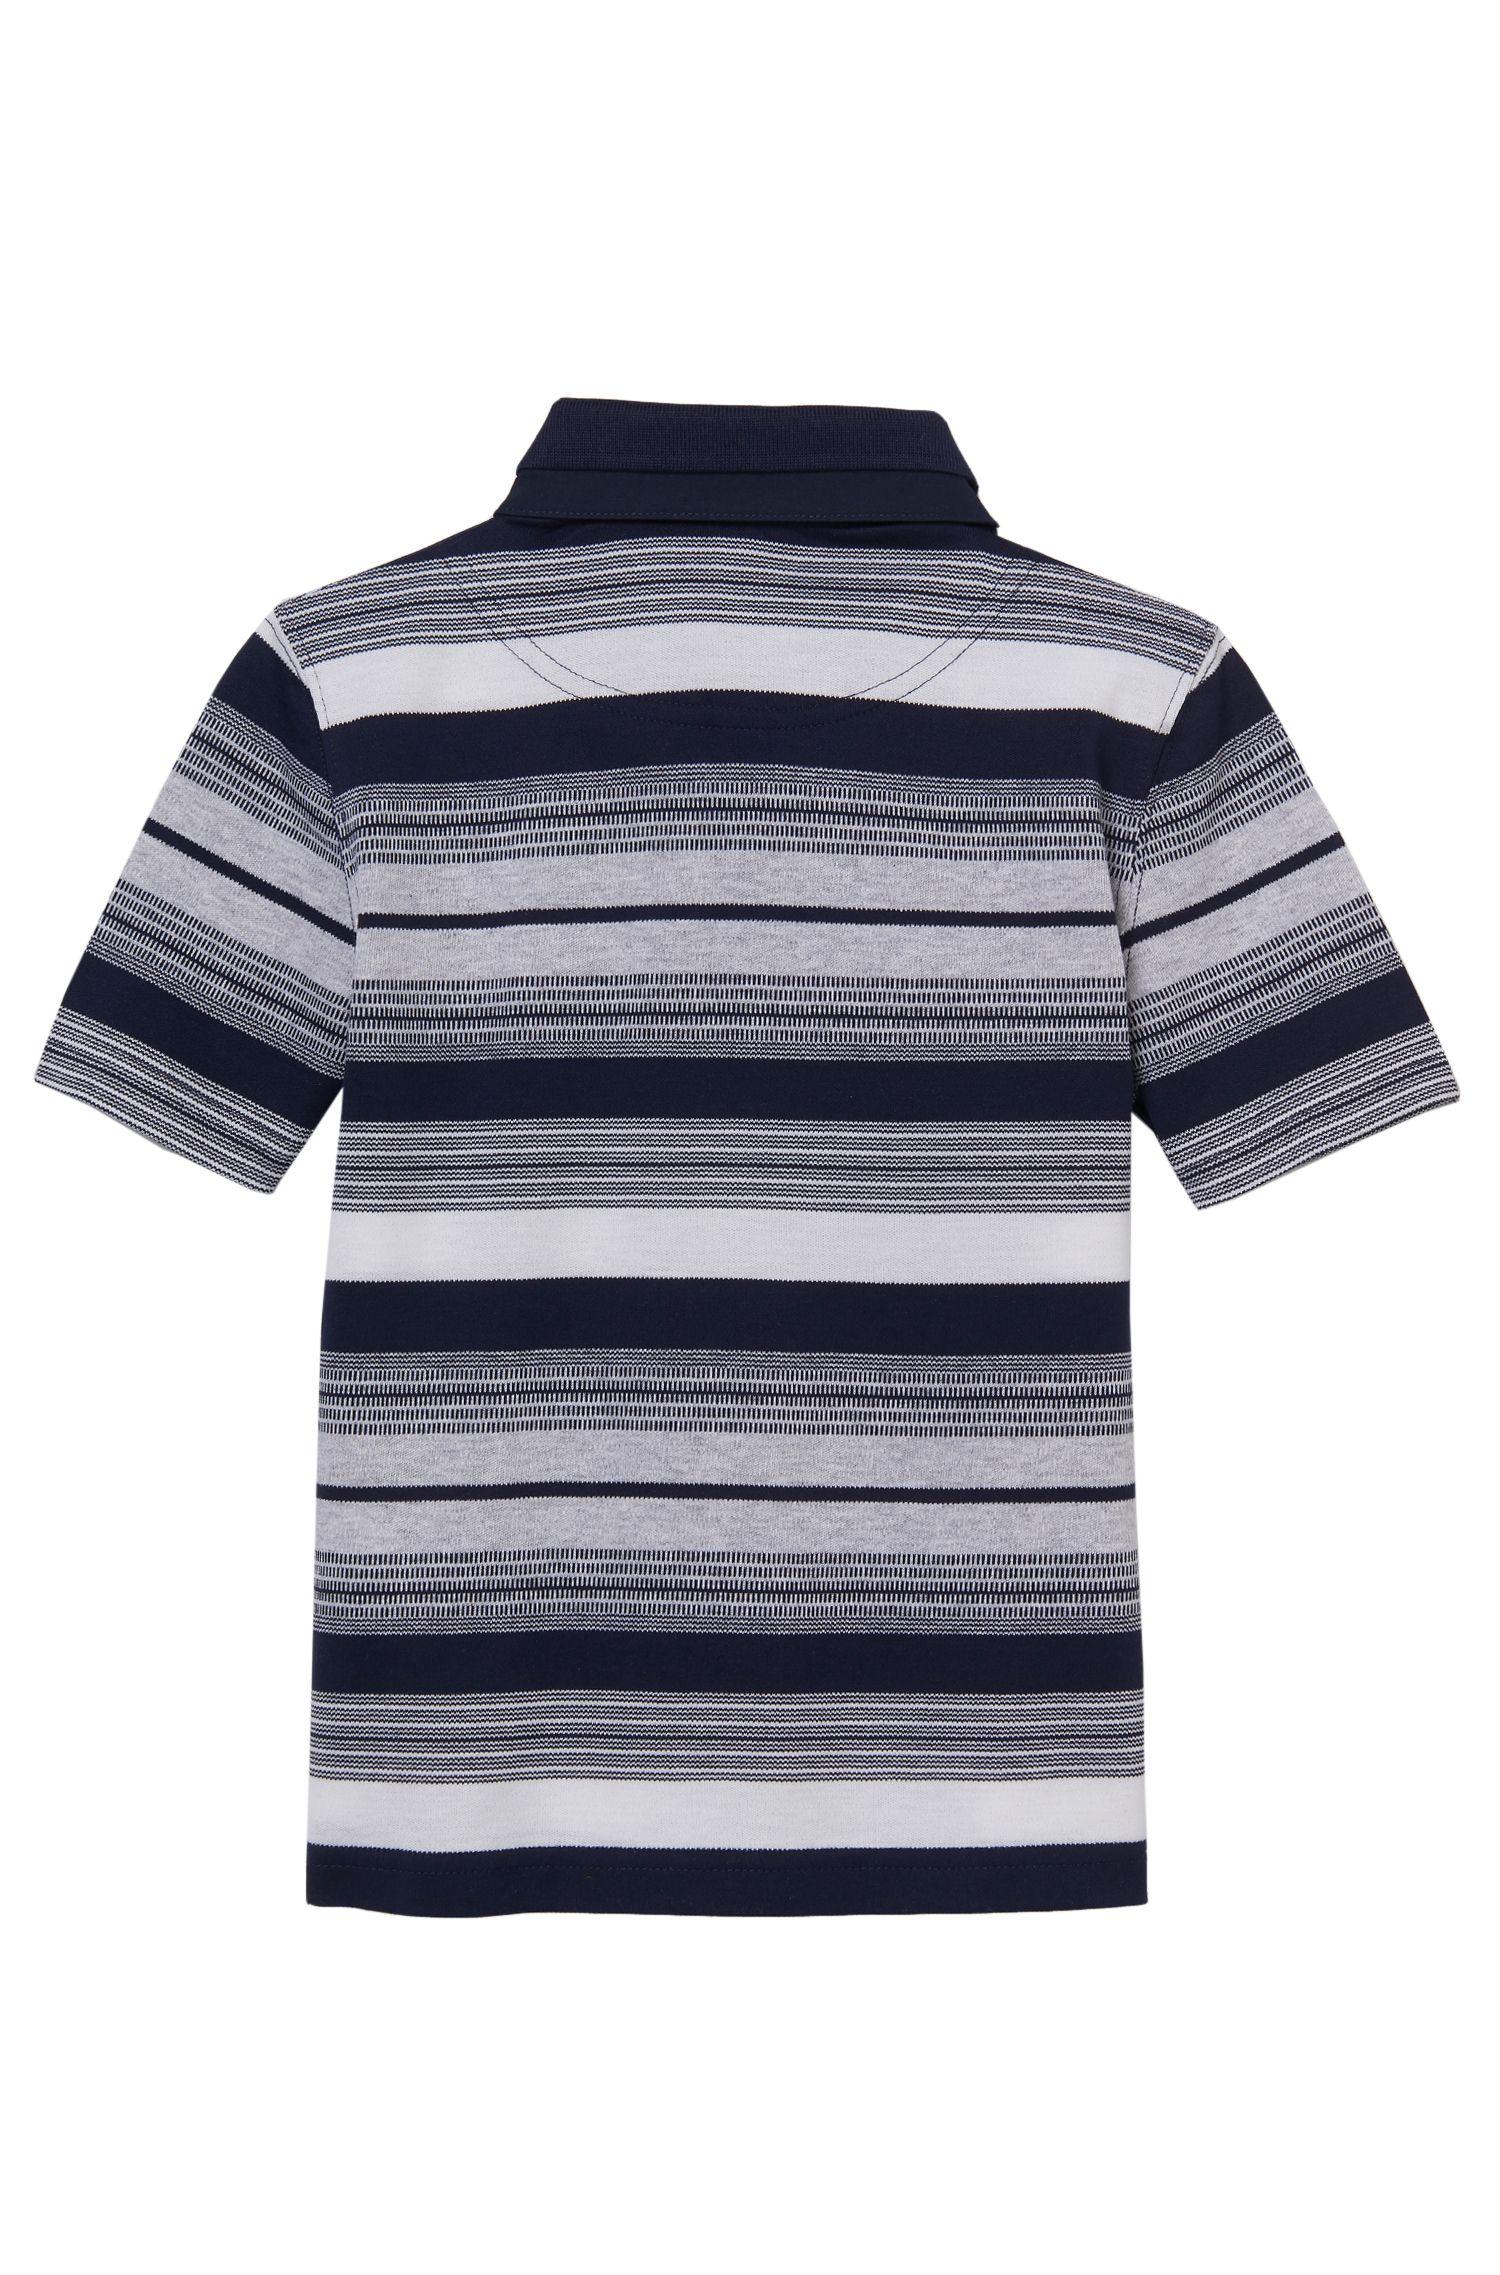 'J25913'   Boys Stretch Cotton Striped Polo Shirt